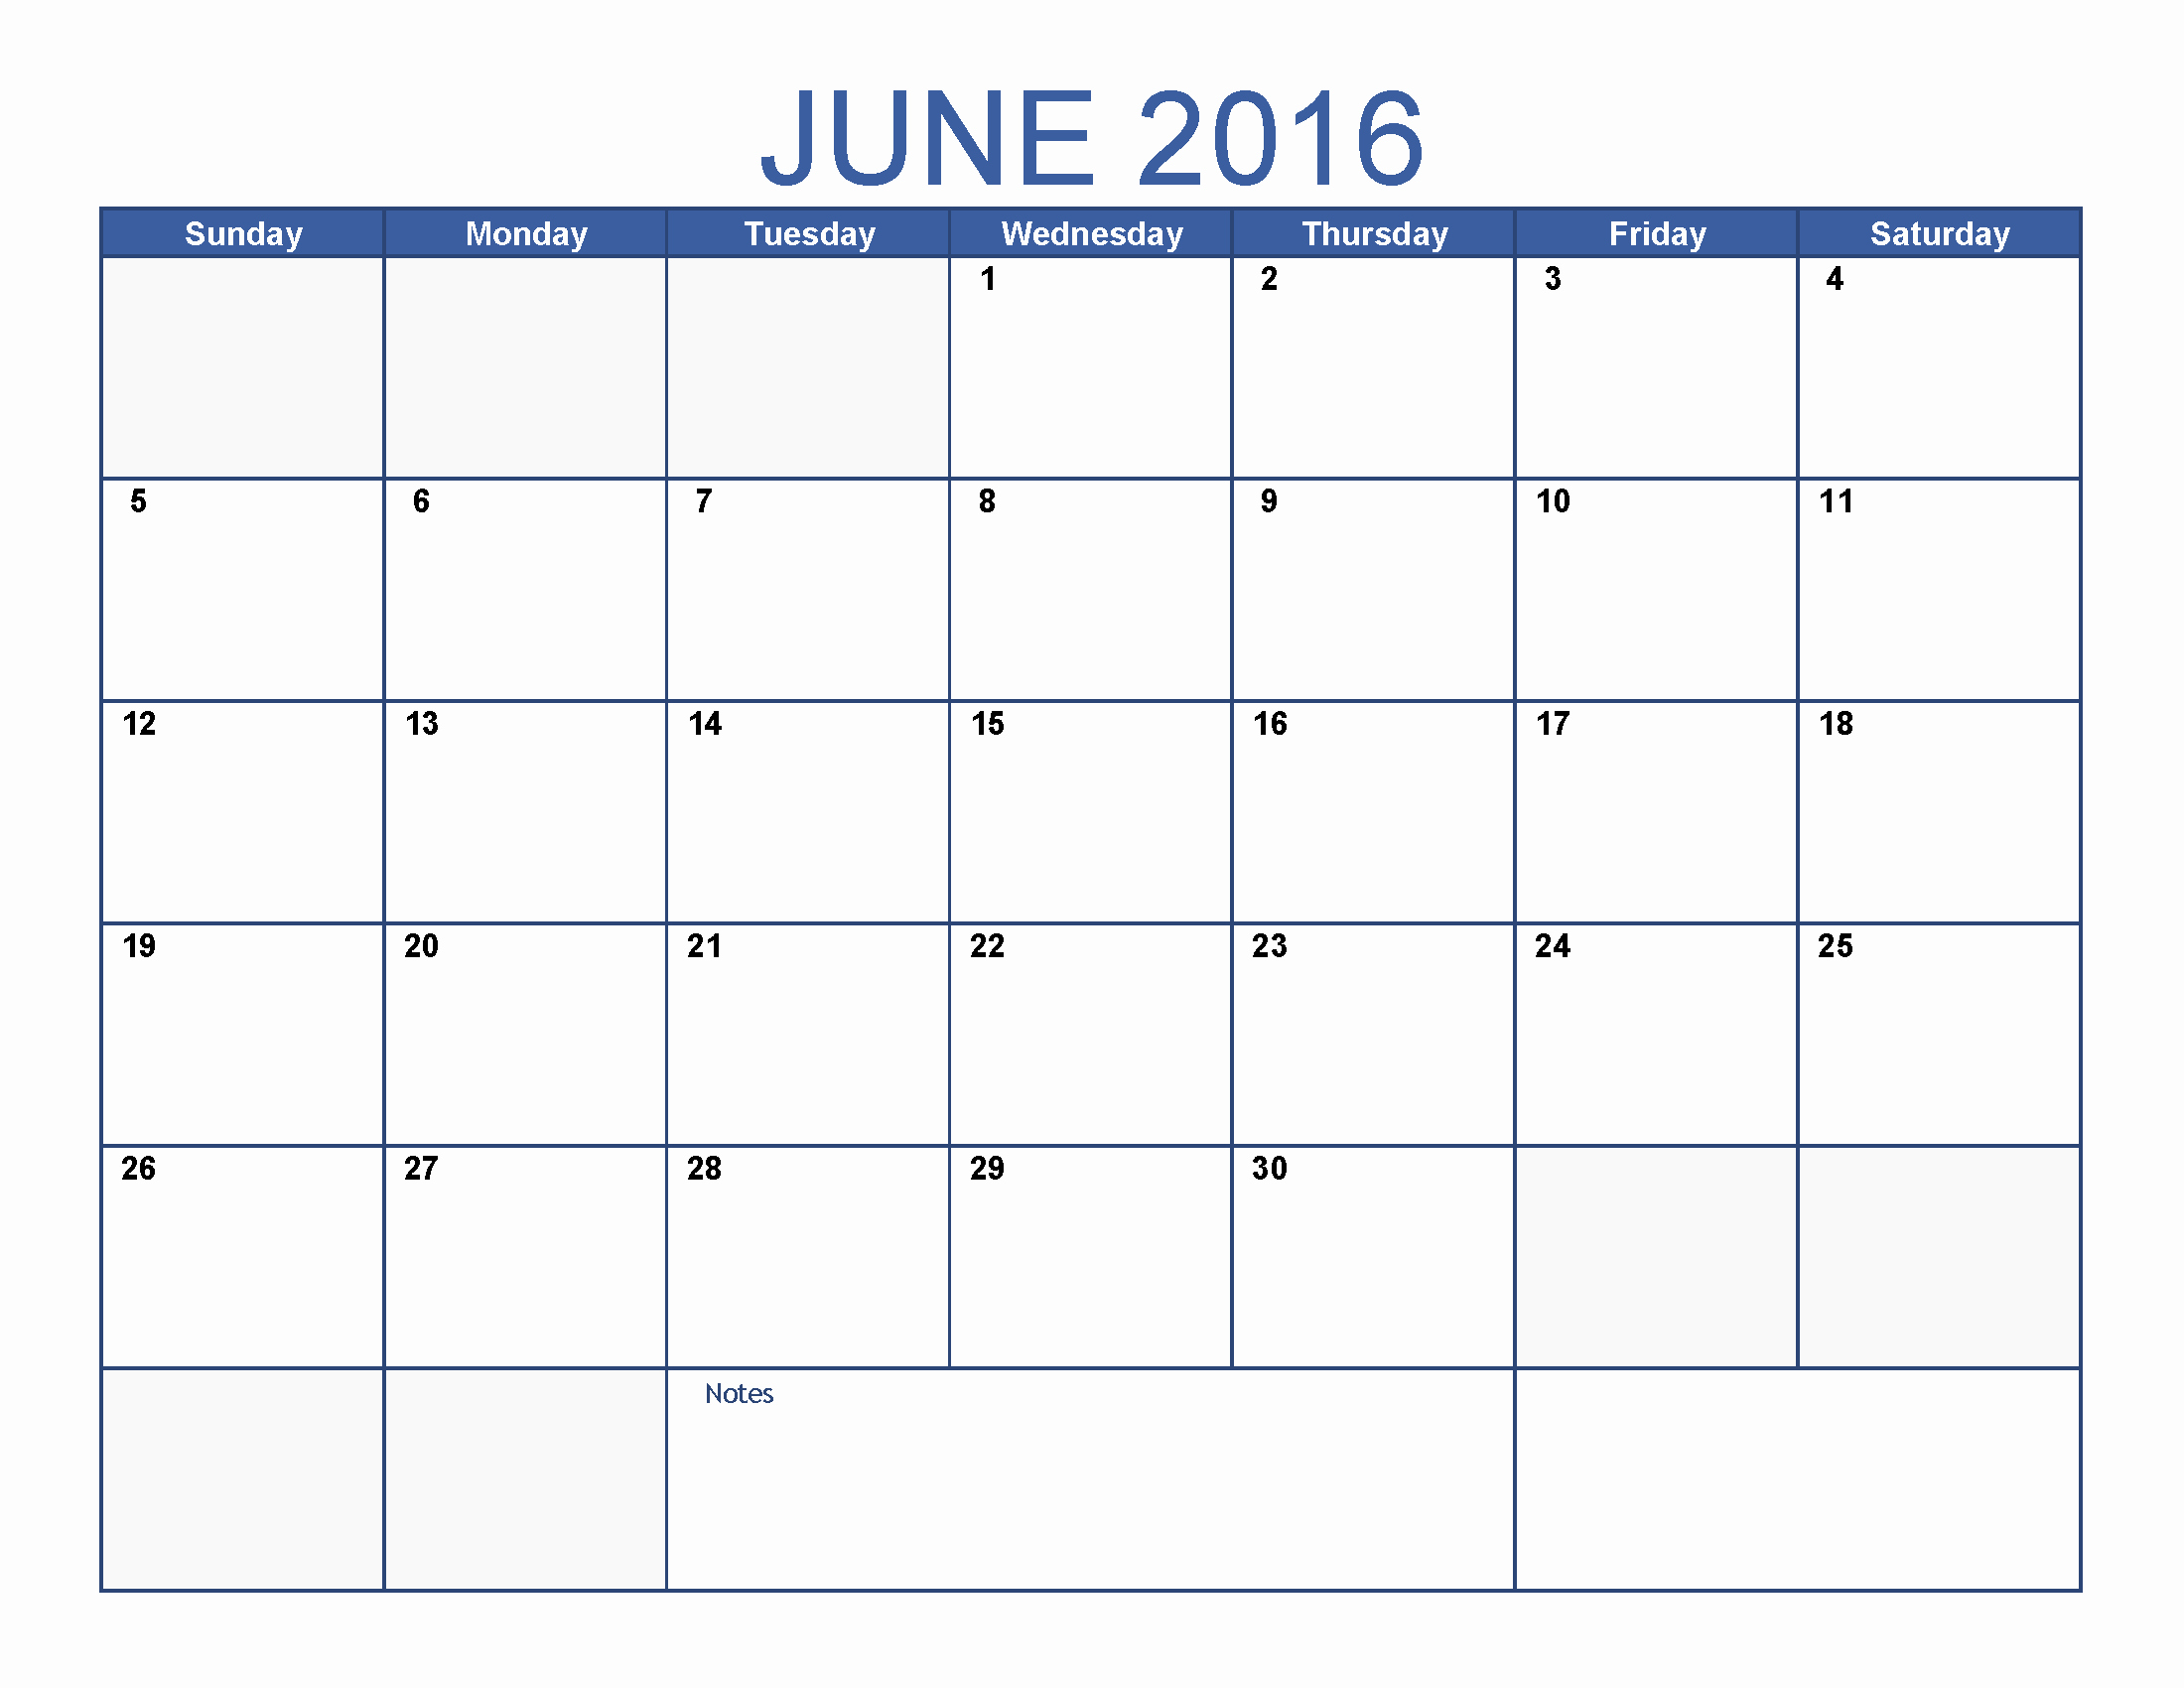 Printable Blank Monthly Calendar Template Luxury June 2016 Printable Calendar Blank Templates